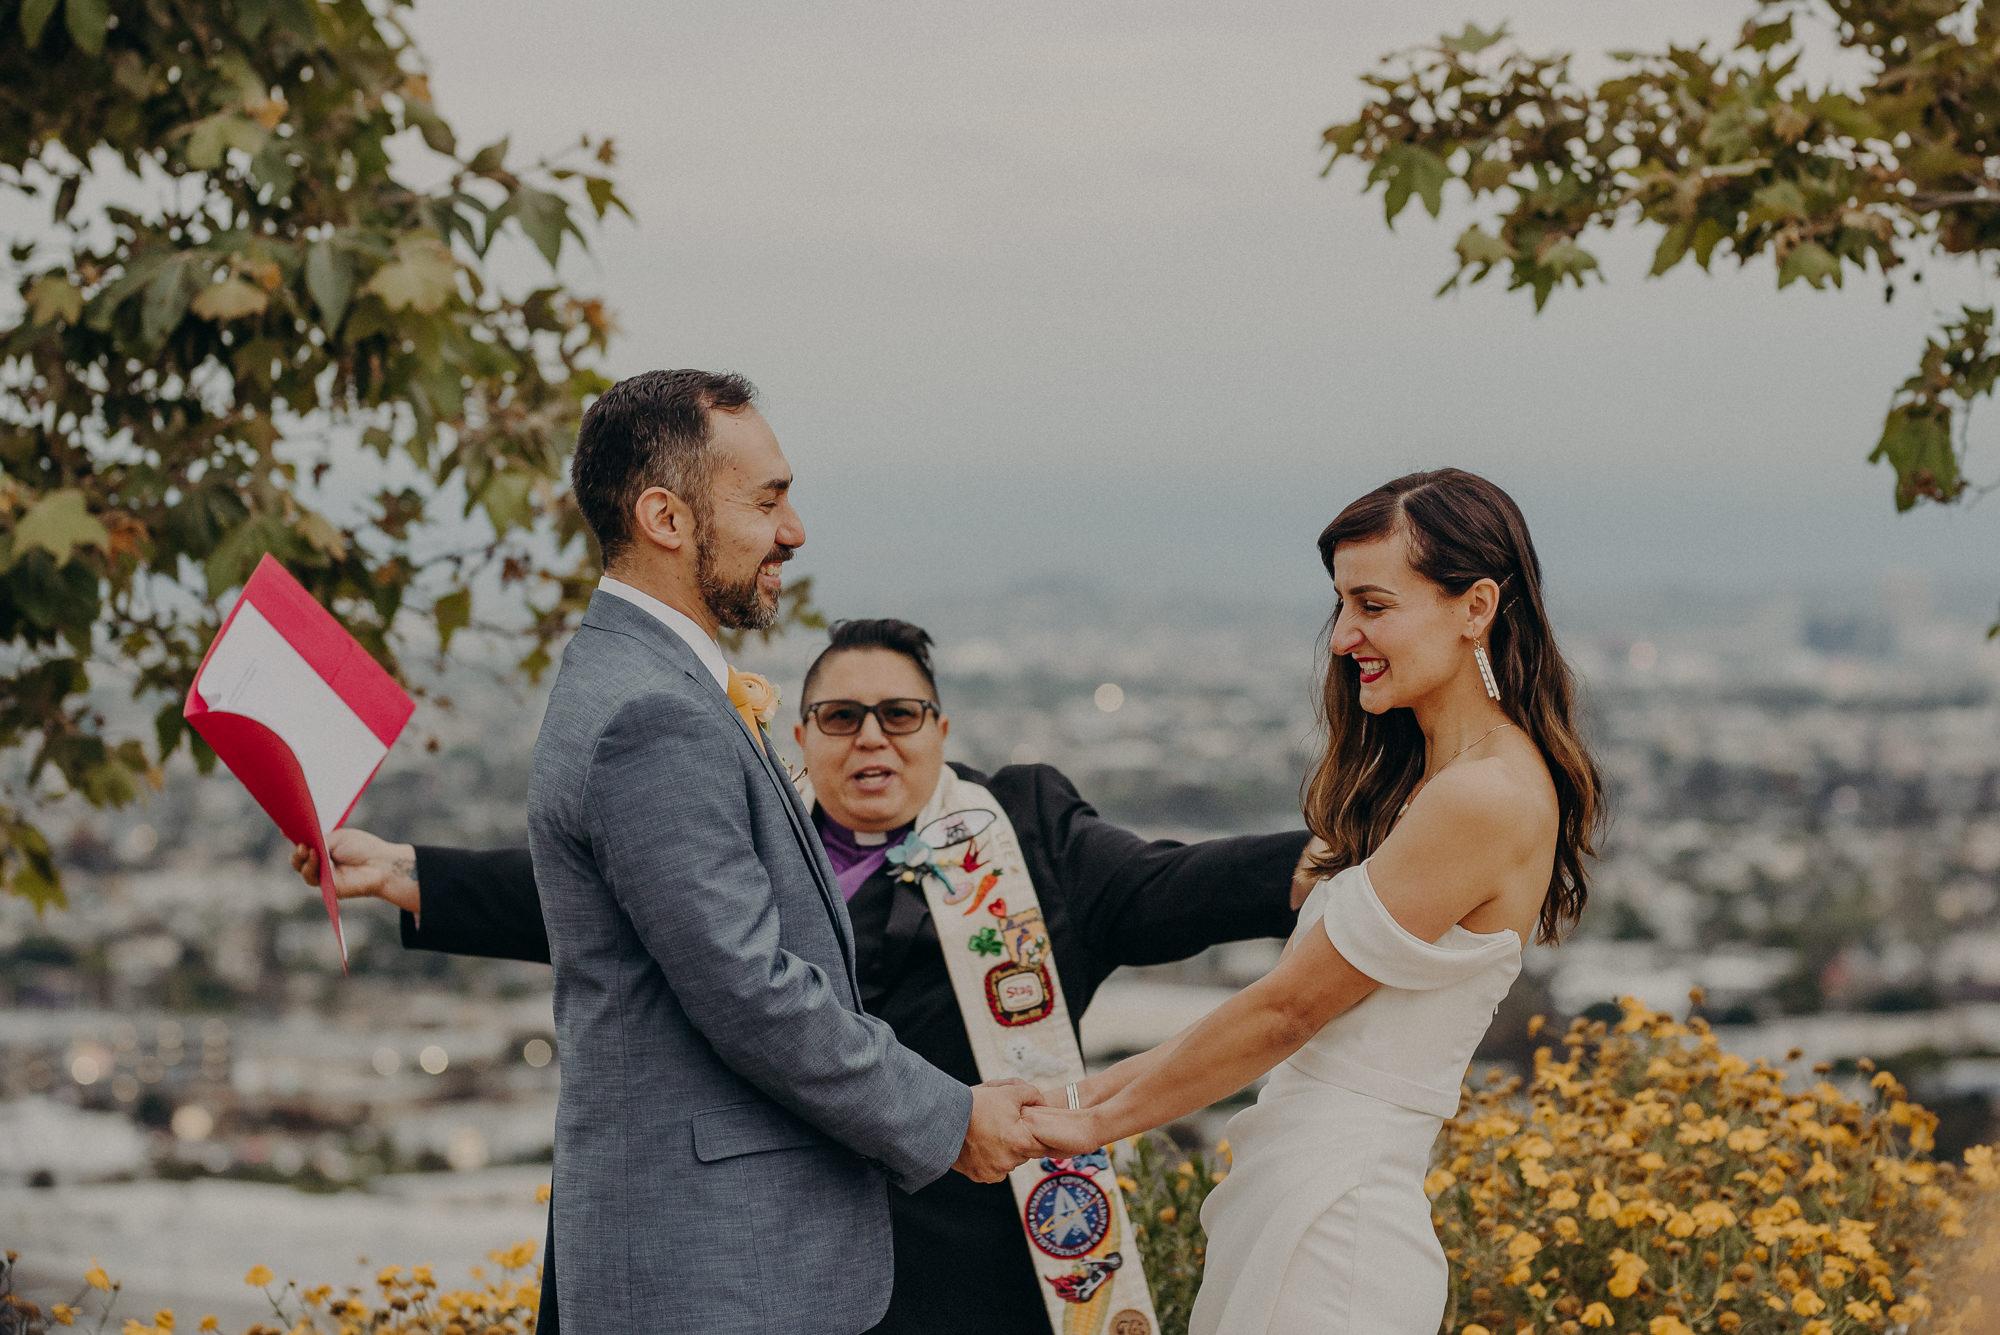 elopement photographer in los angeles - la wedding photographer - isaiahandtaylor.com-068.jpg